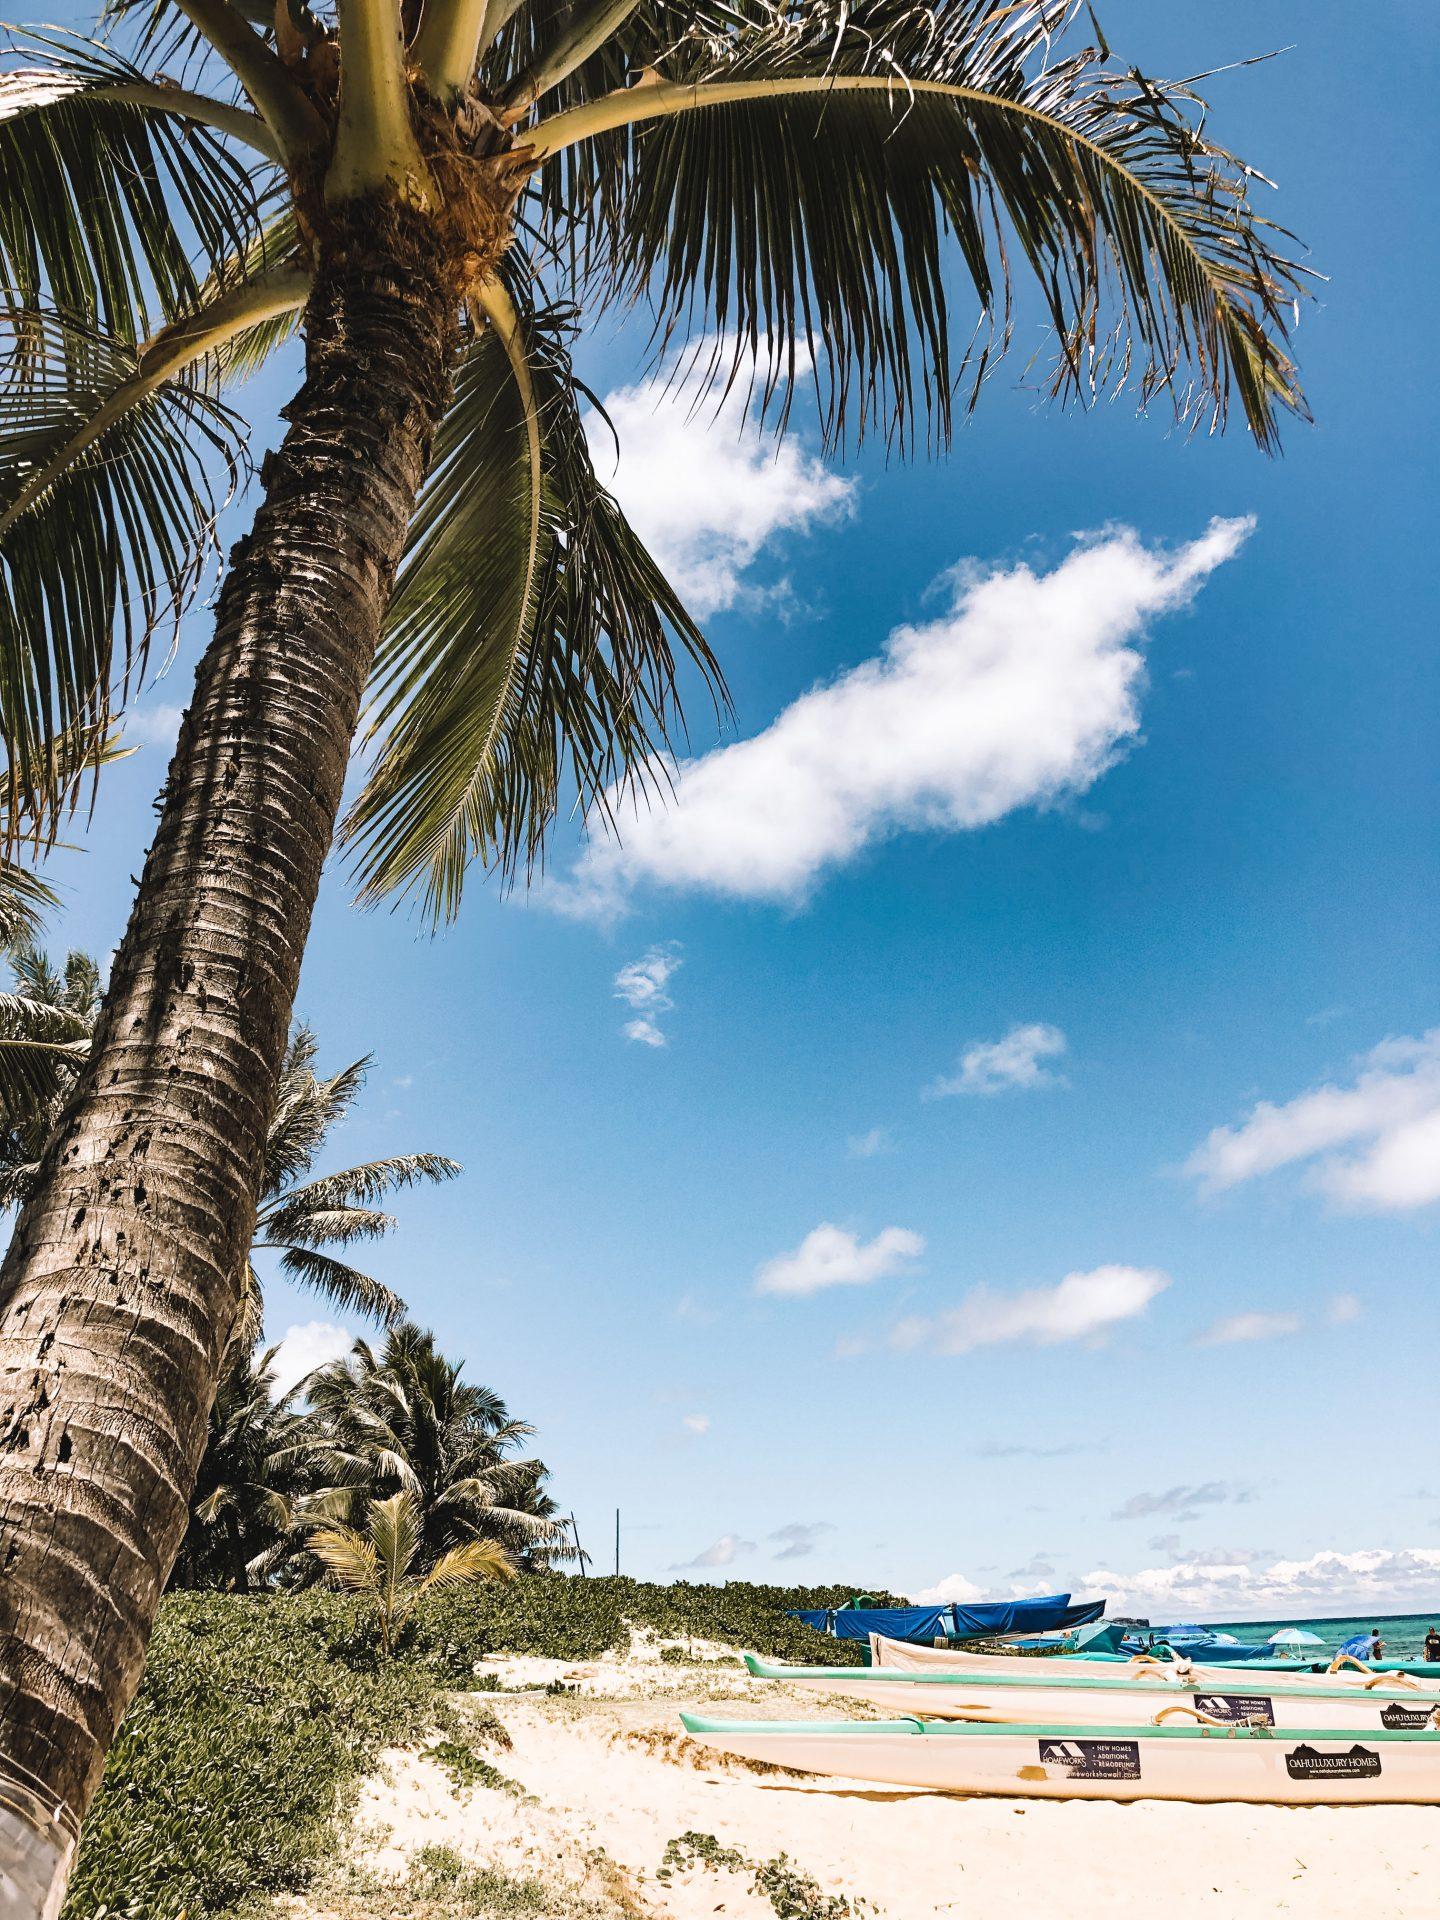 Visiter Hawaii - Blondie Baby blog mode et voyages